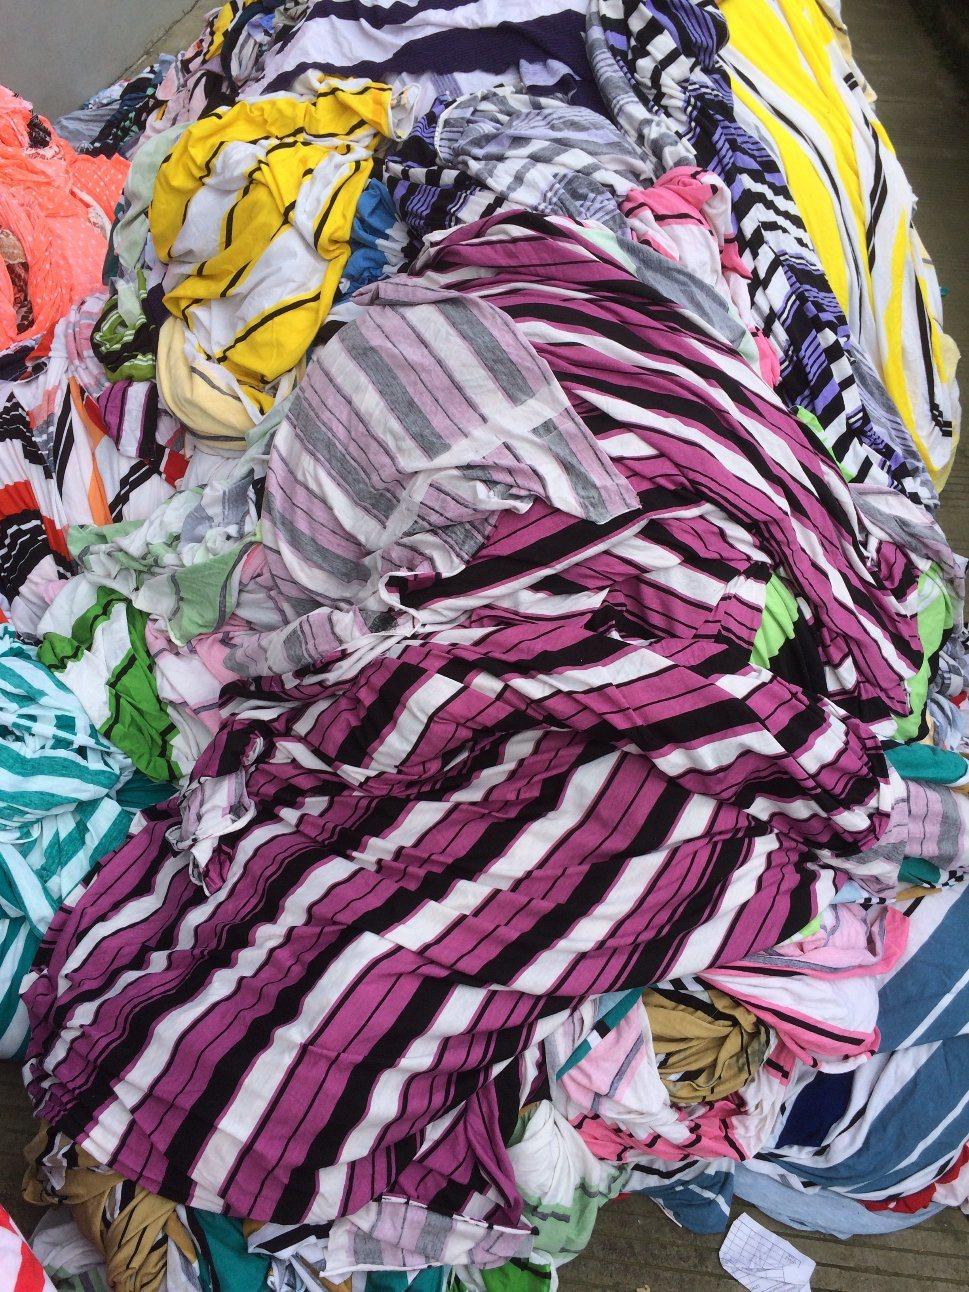 Jesery Knitting Fabrics in Stocks